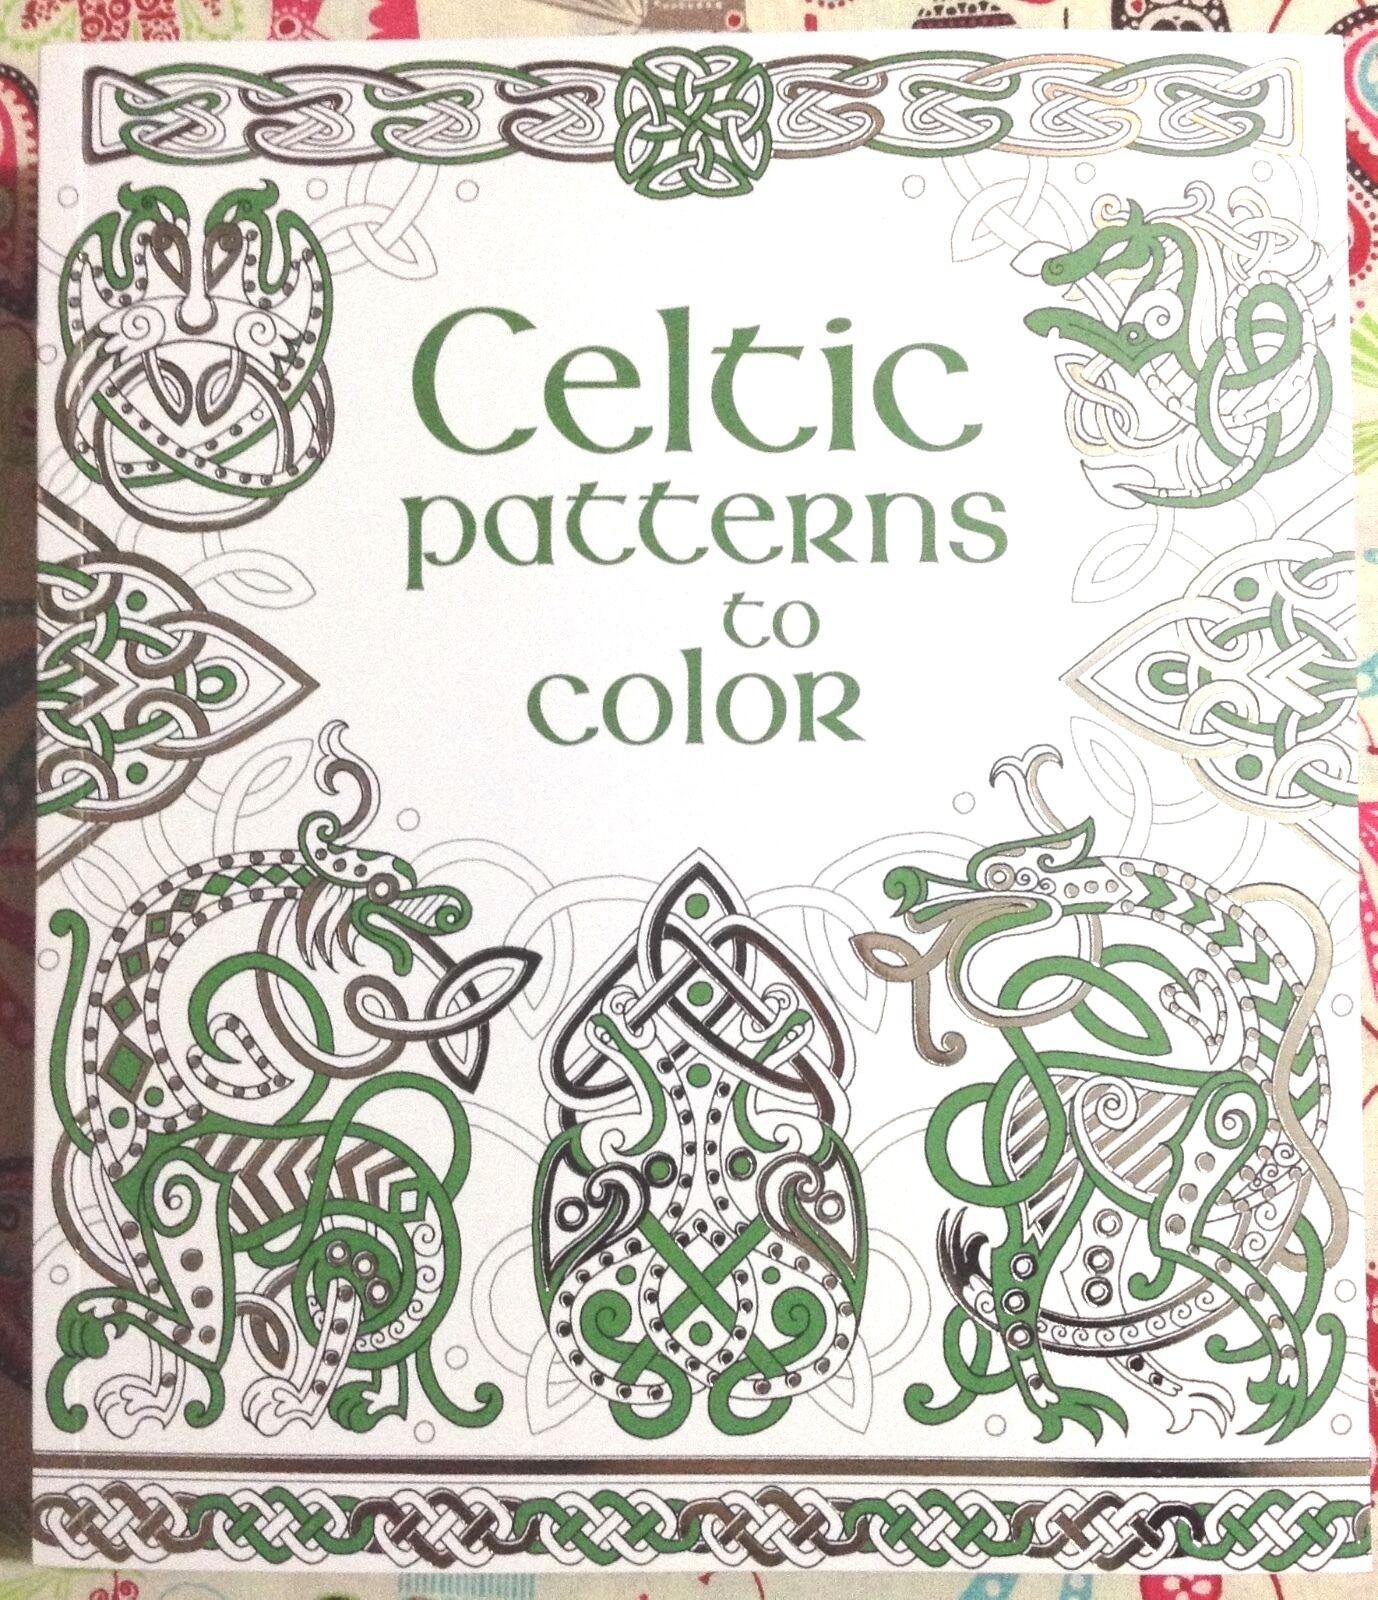 picture 1 of 1 - Usborne Coloring Books